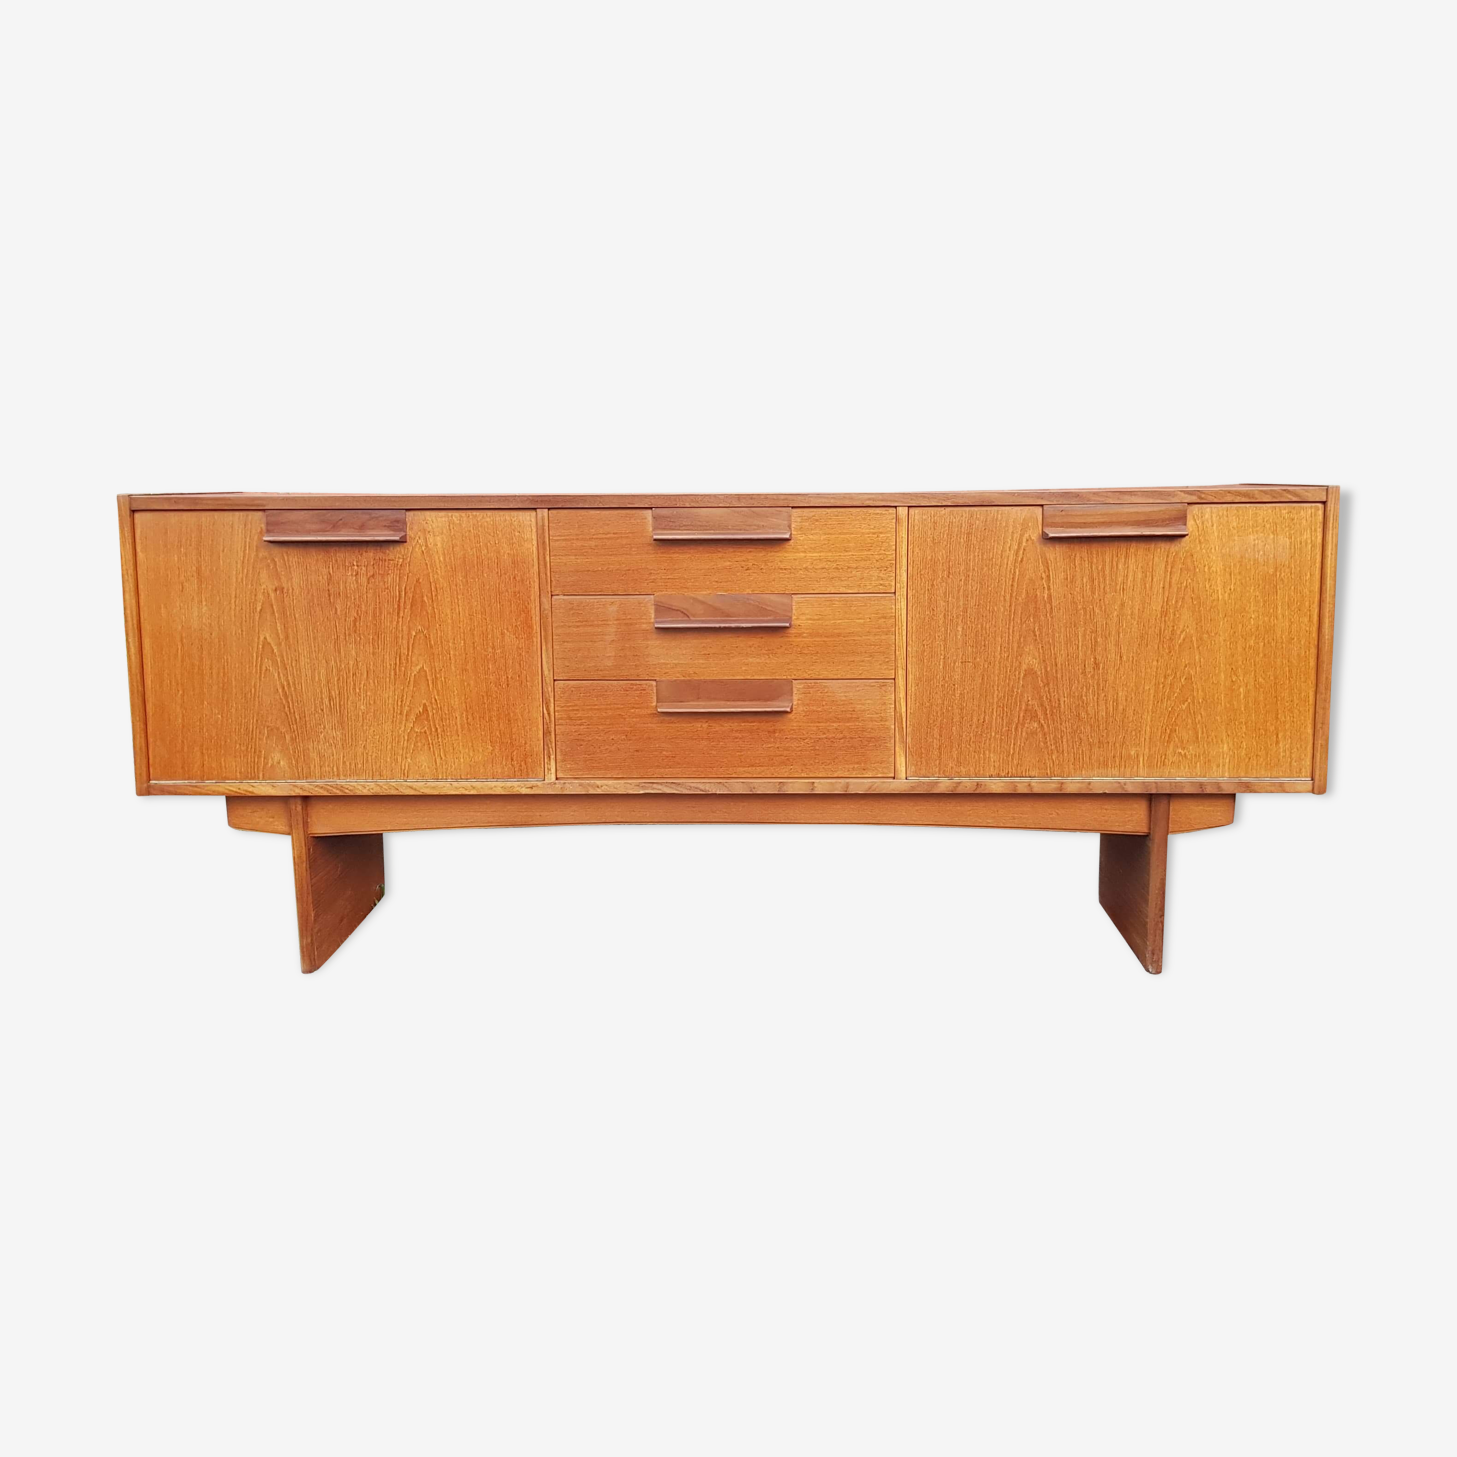 Scandinavian sideboard dating back to the 1960s teak